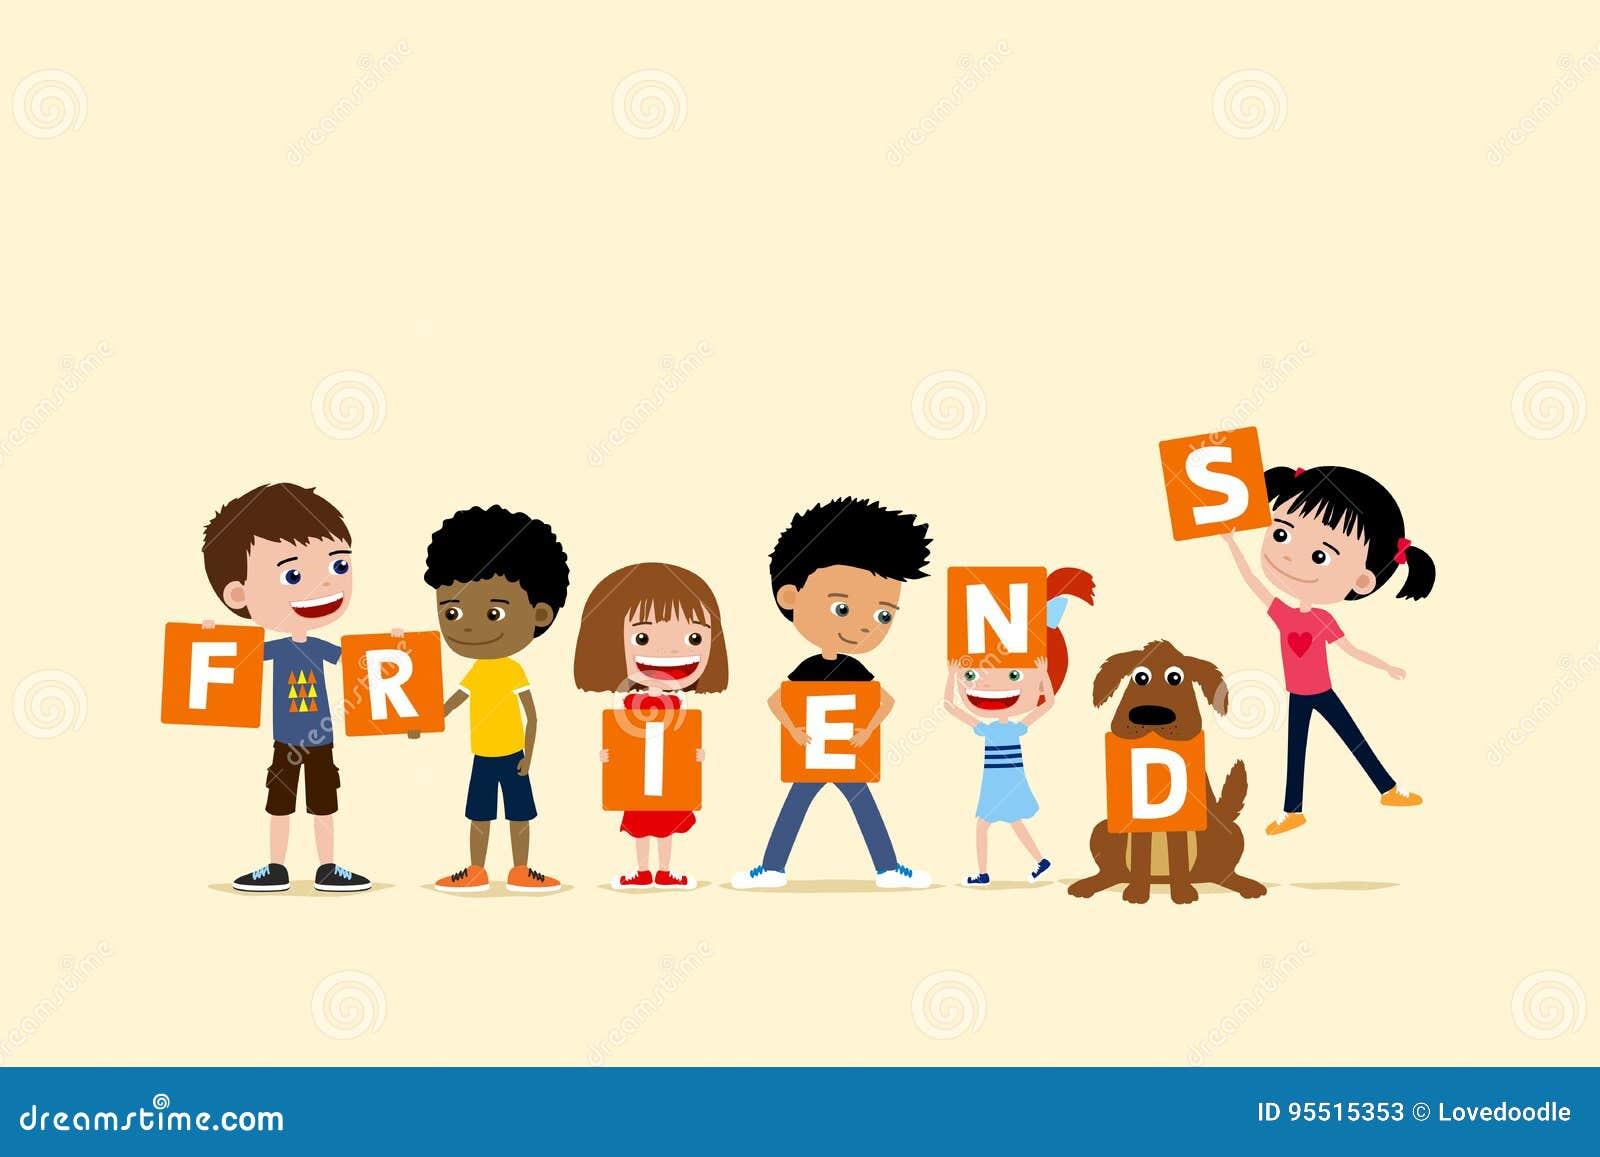 Cartoon Group Friends Boys Girls Stock Illustrations 1 807 Cartoon Group Friends Boys Girls Stock Illustrations Vectors Clipart Dreamstime